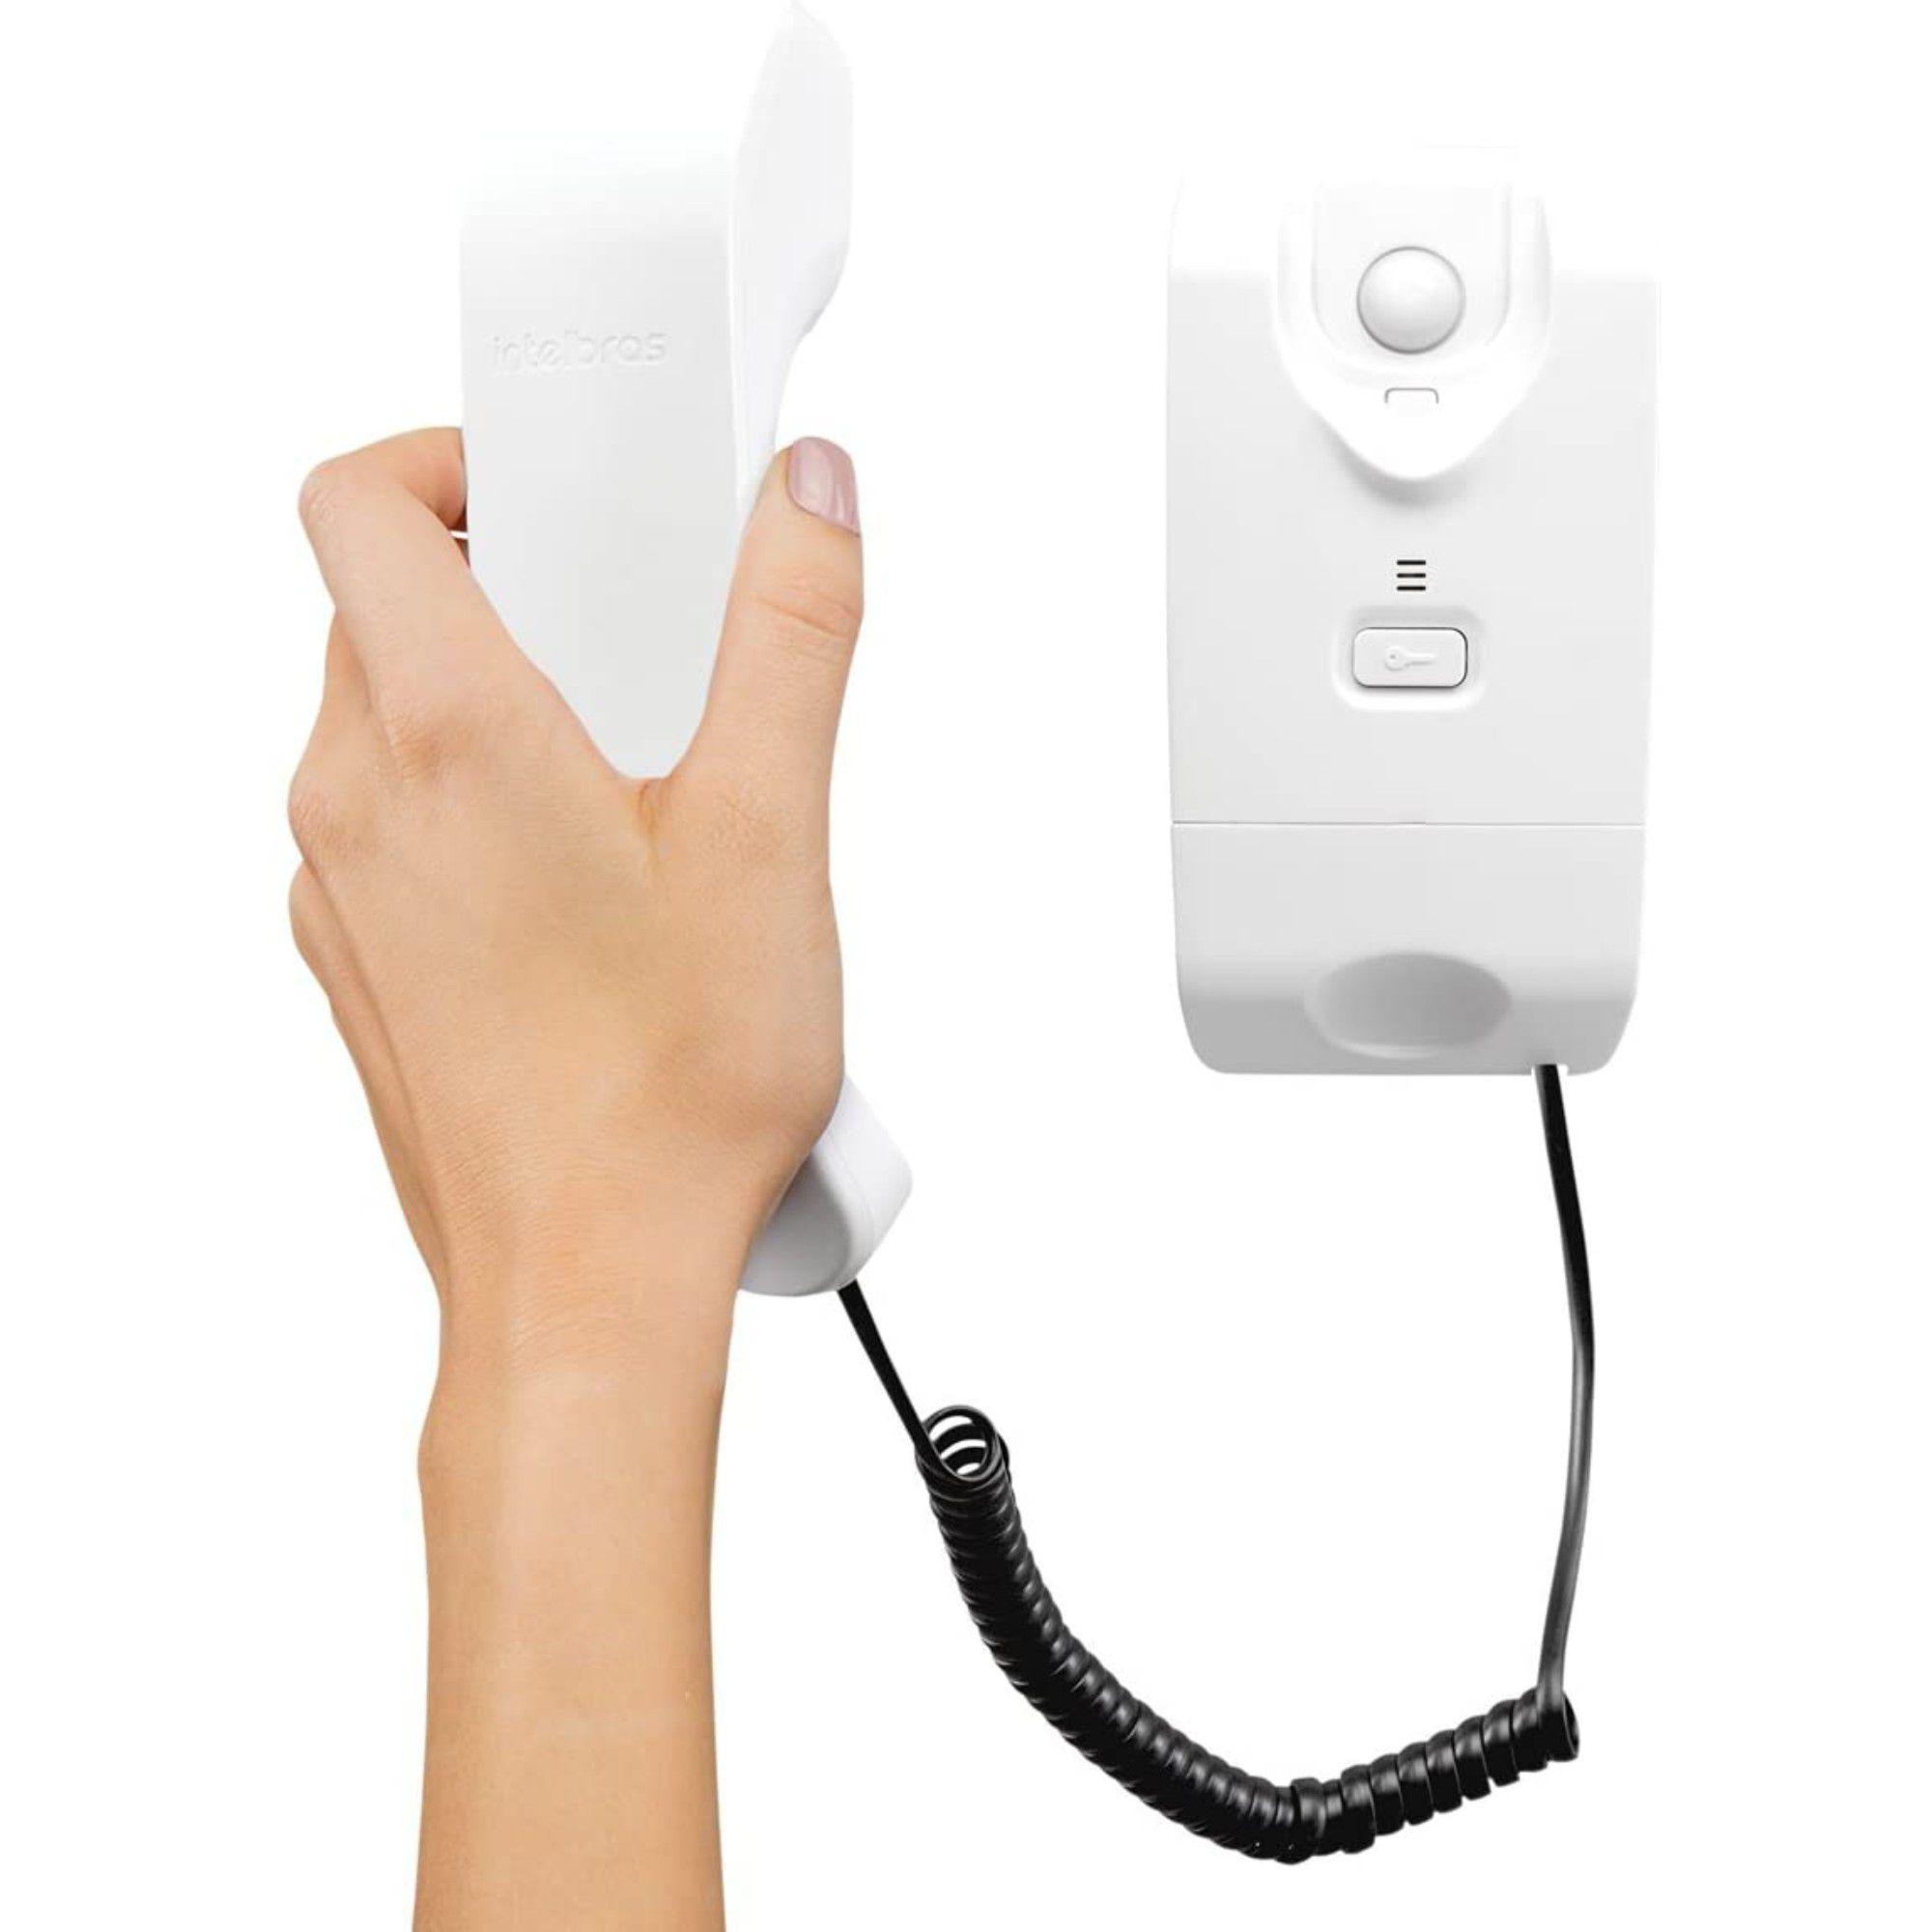 Porteiro Eletrônico Interfone Residencial Intelbras Ipr1010